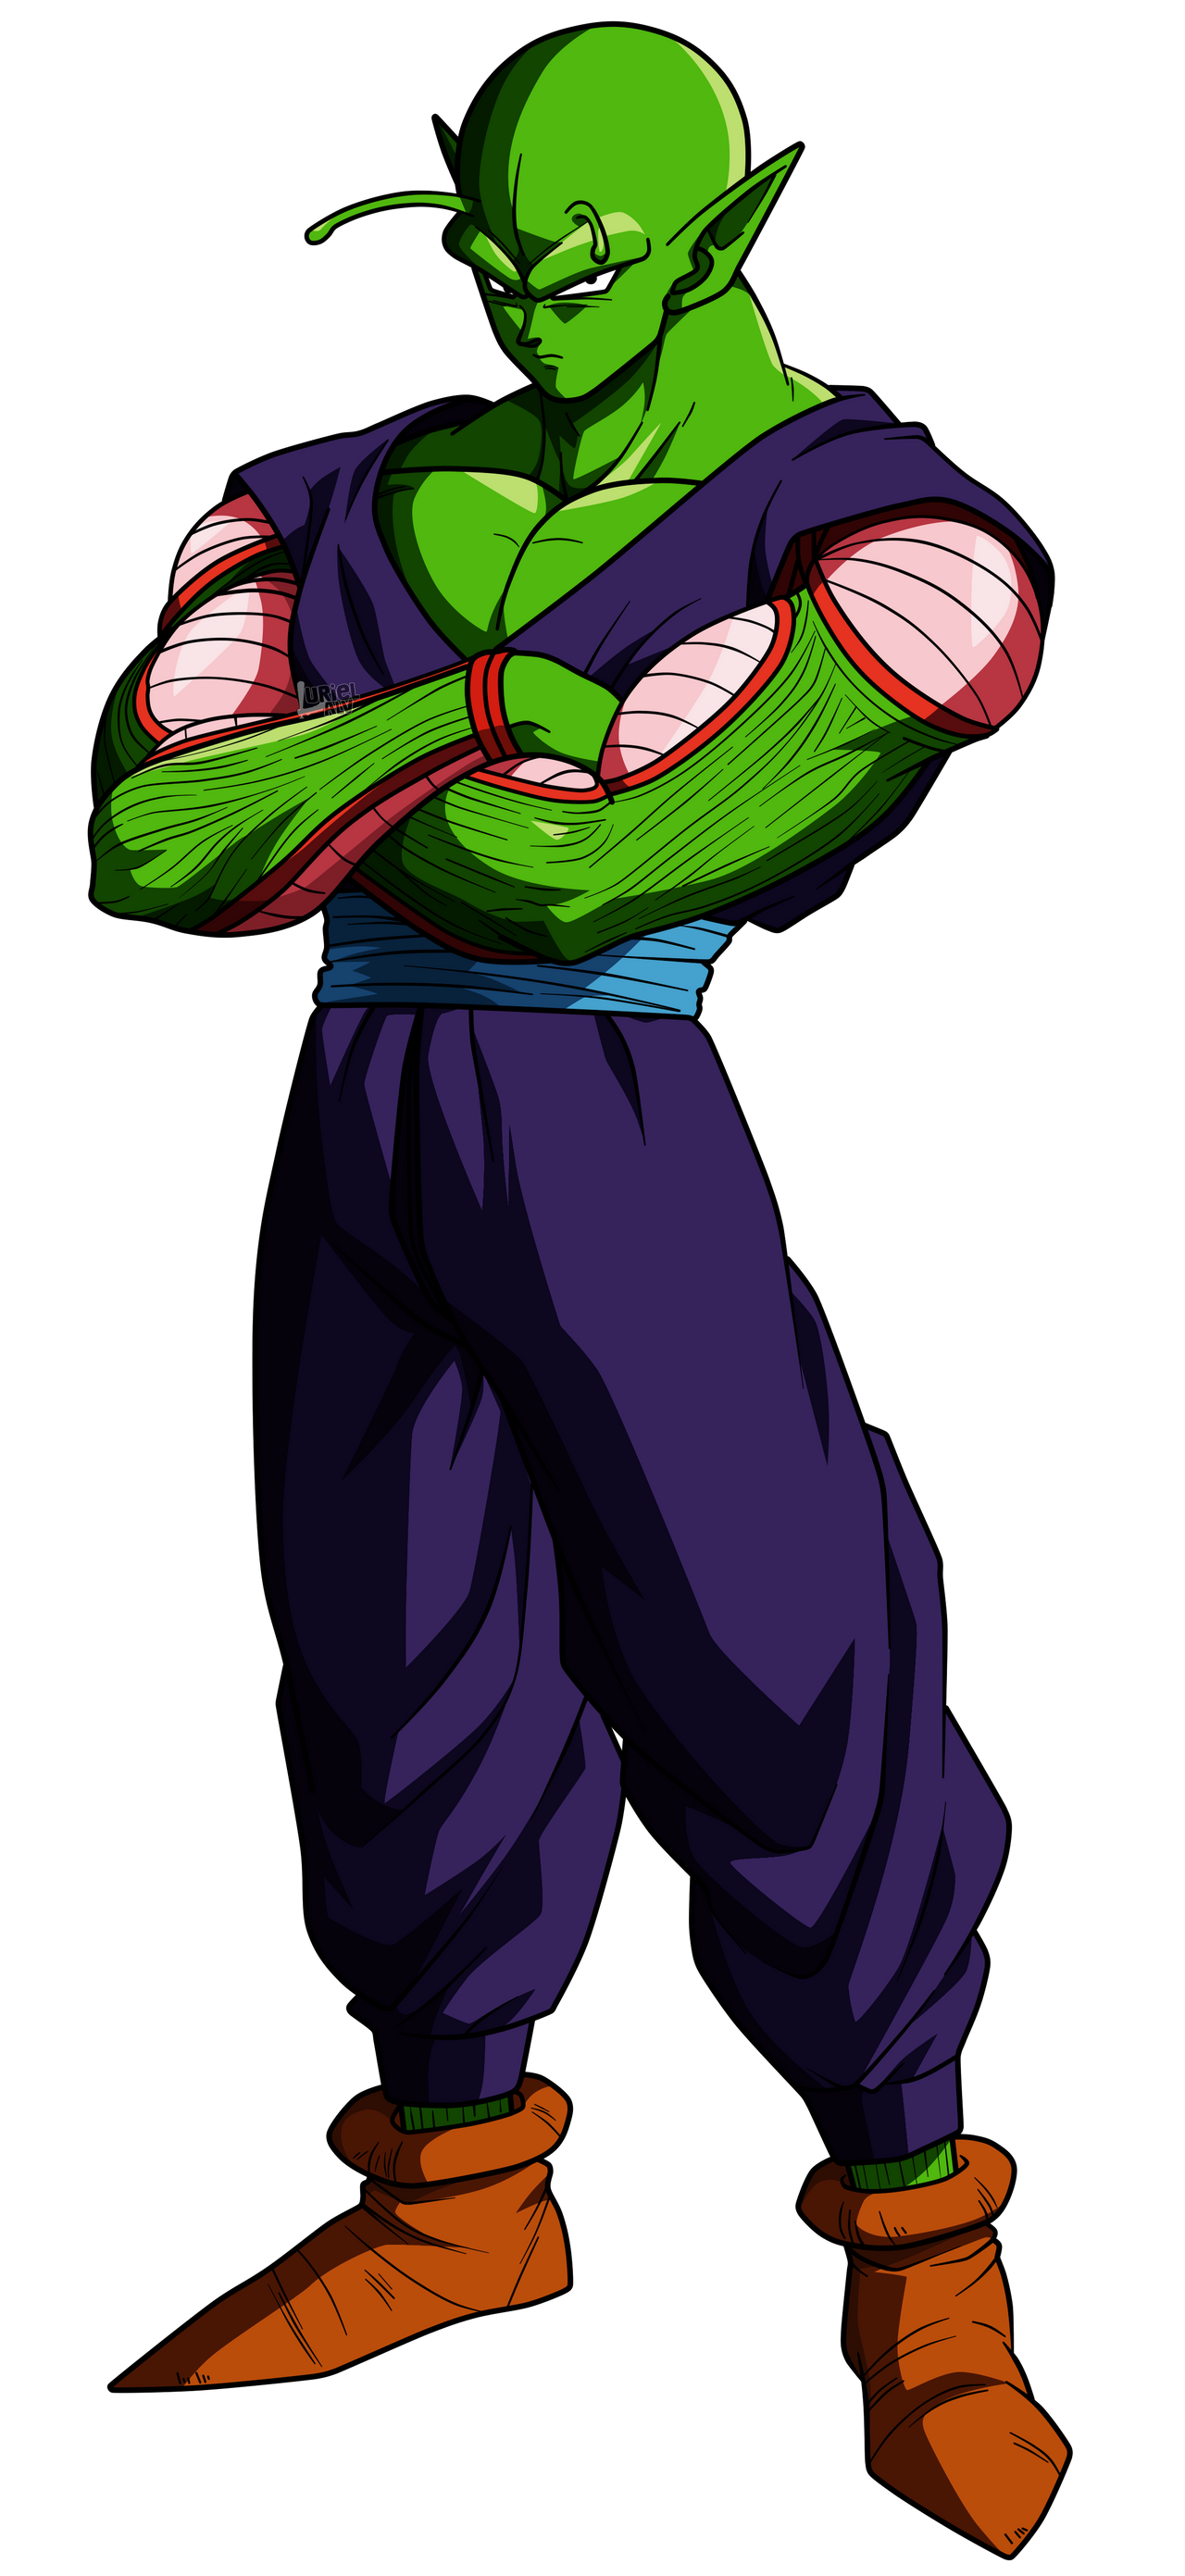 Piccolo #2 by UrielALV on DeviantArt